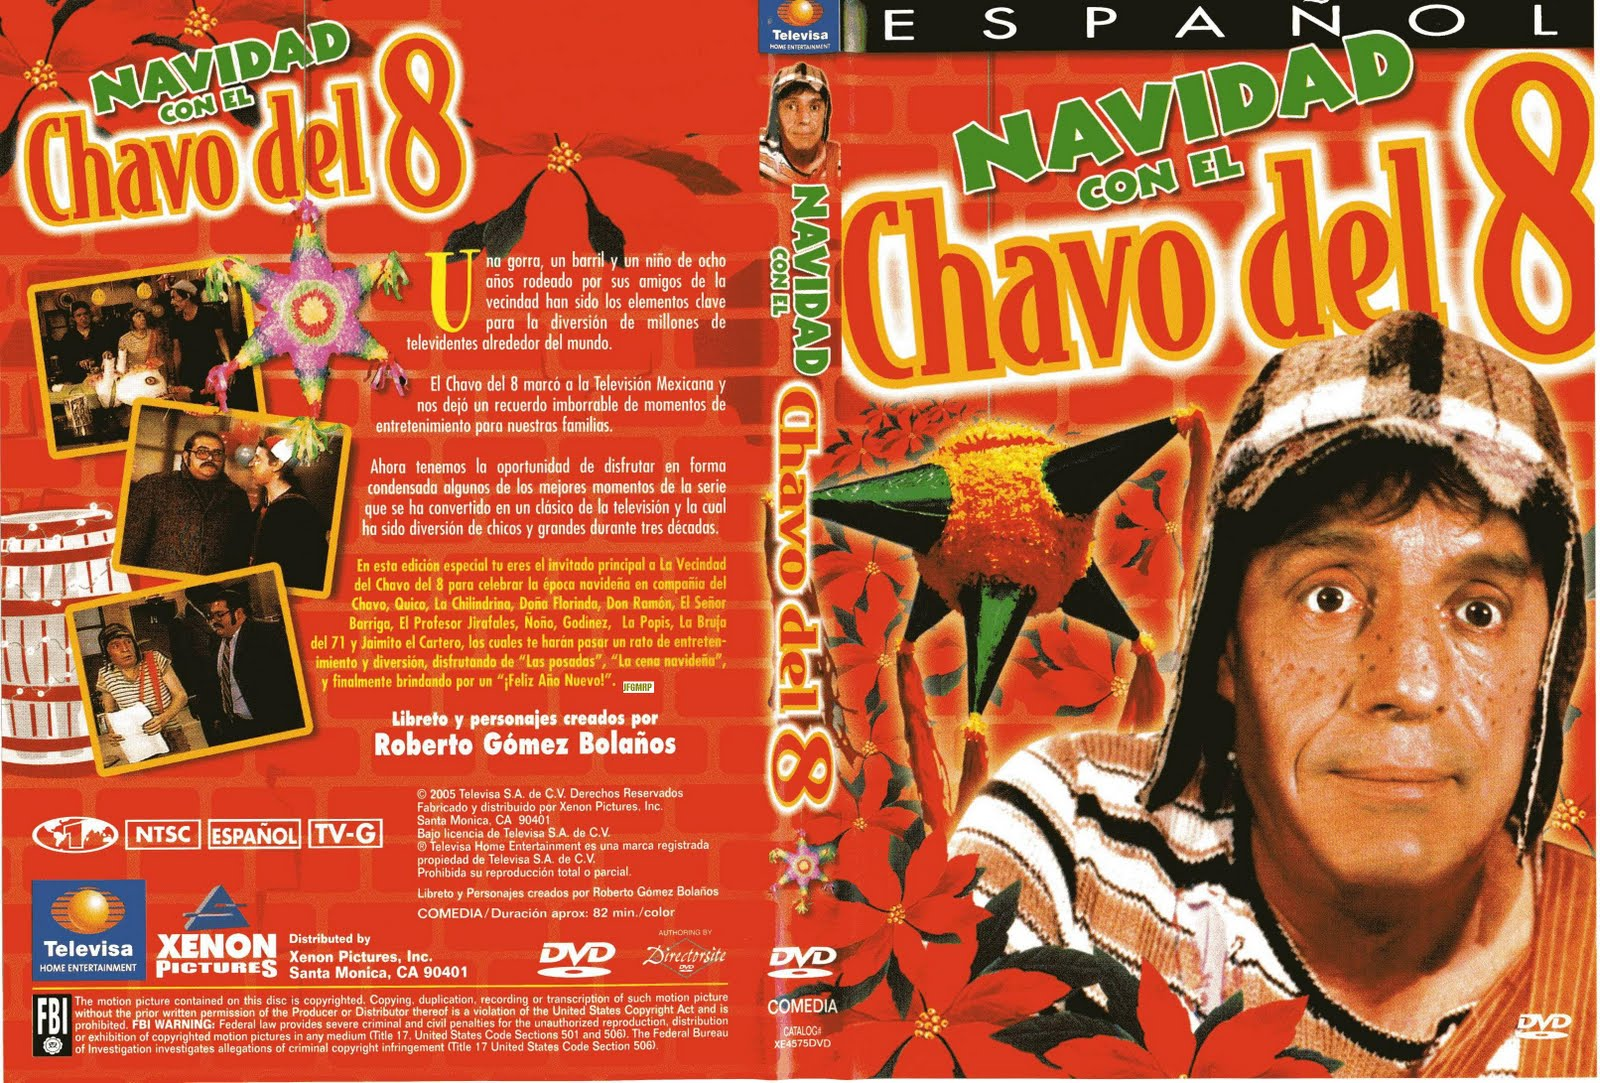 http://2.bp.blogspot.com/_Yo9jdb_UjCw/S85bBNqdrxI/AAAAAAAAABE/YIdeM127zq4/s1600/El_Chavo_Del_8_-_Navidad_Con_El_Chavo_Del_8_por_mrubina.jpg